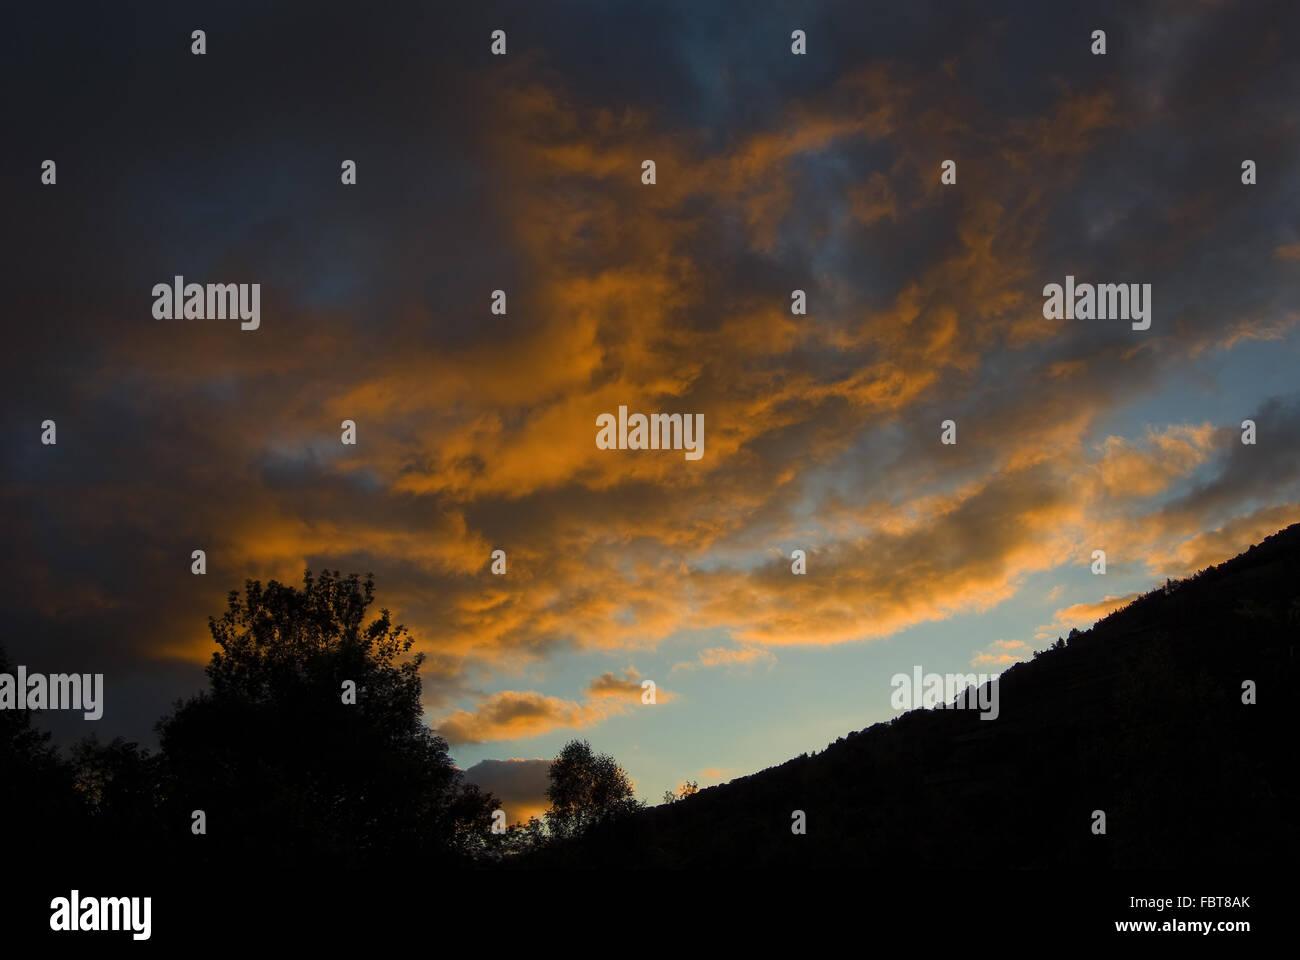 Abendstimmung - Stock Image